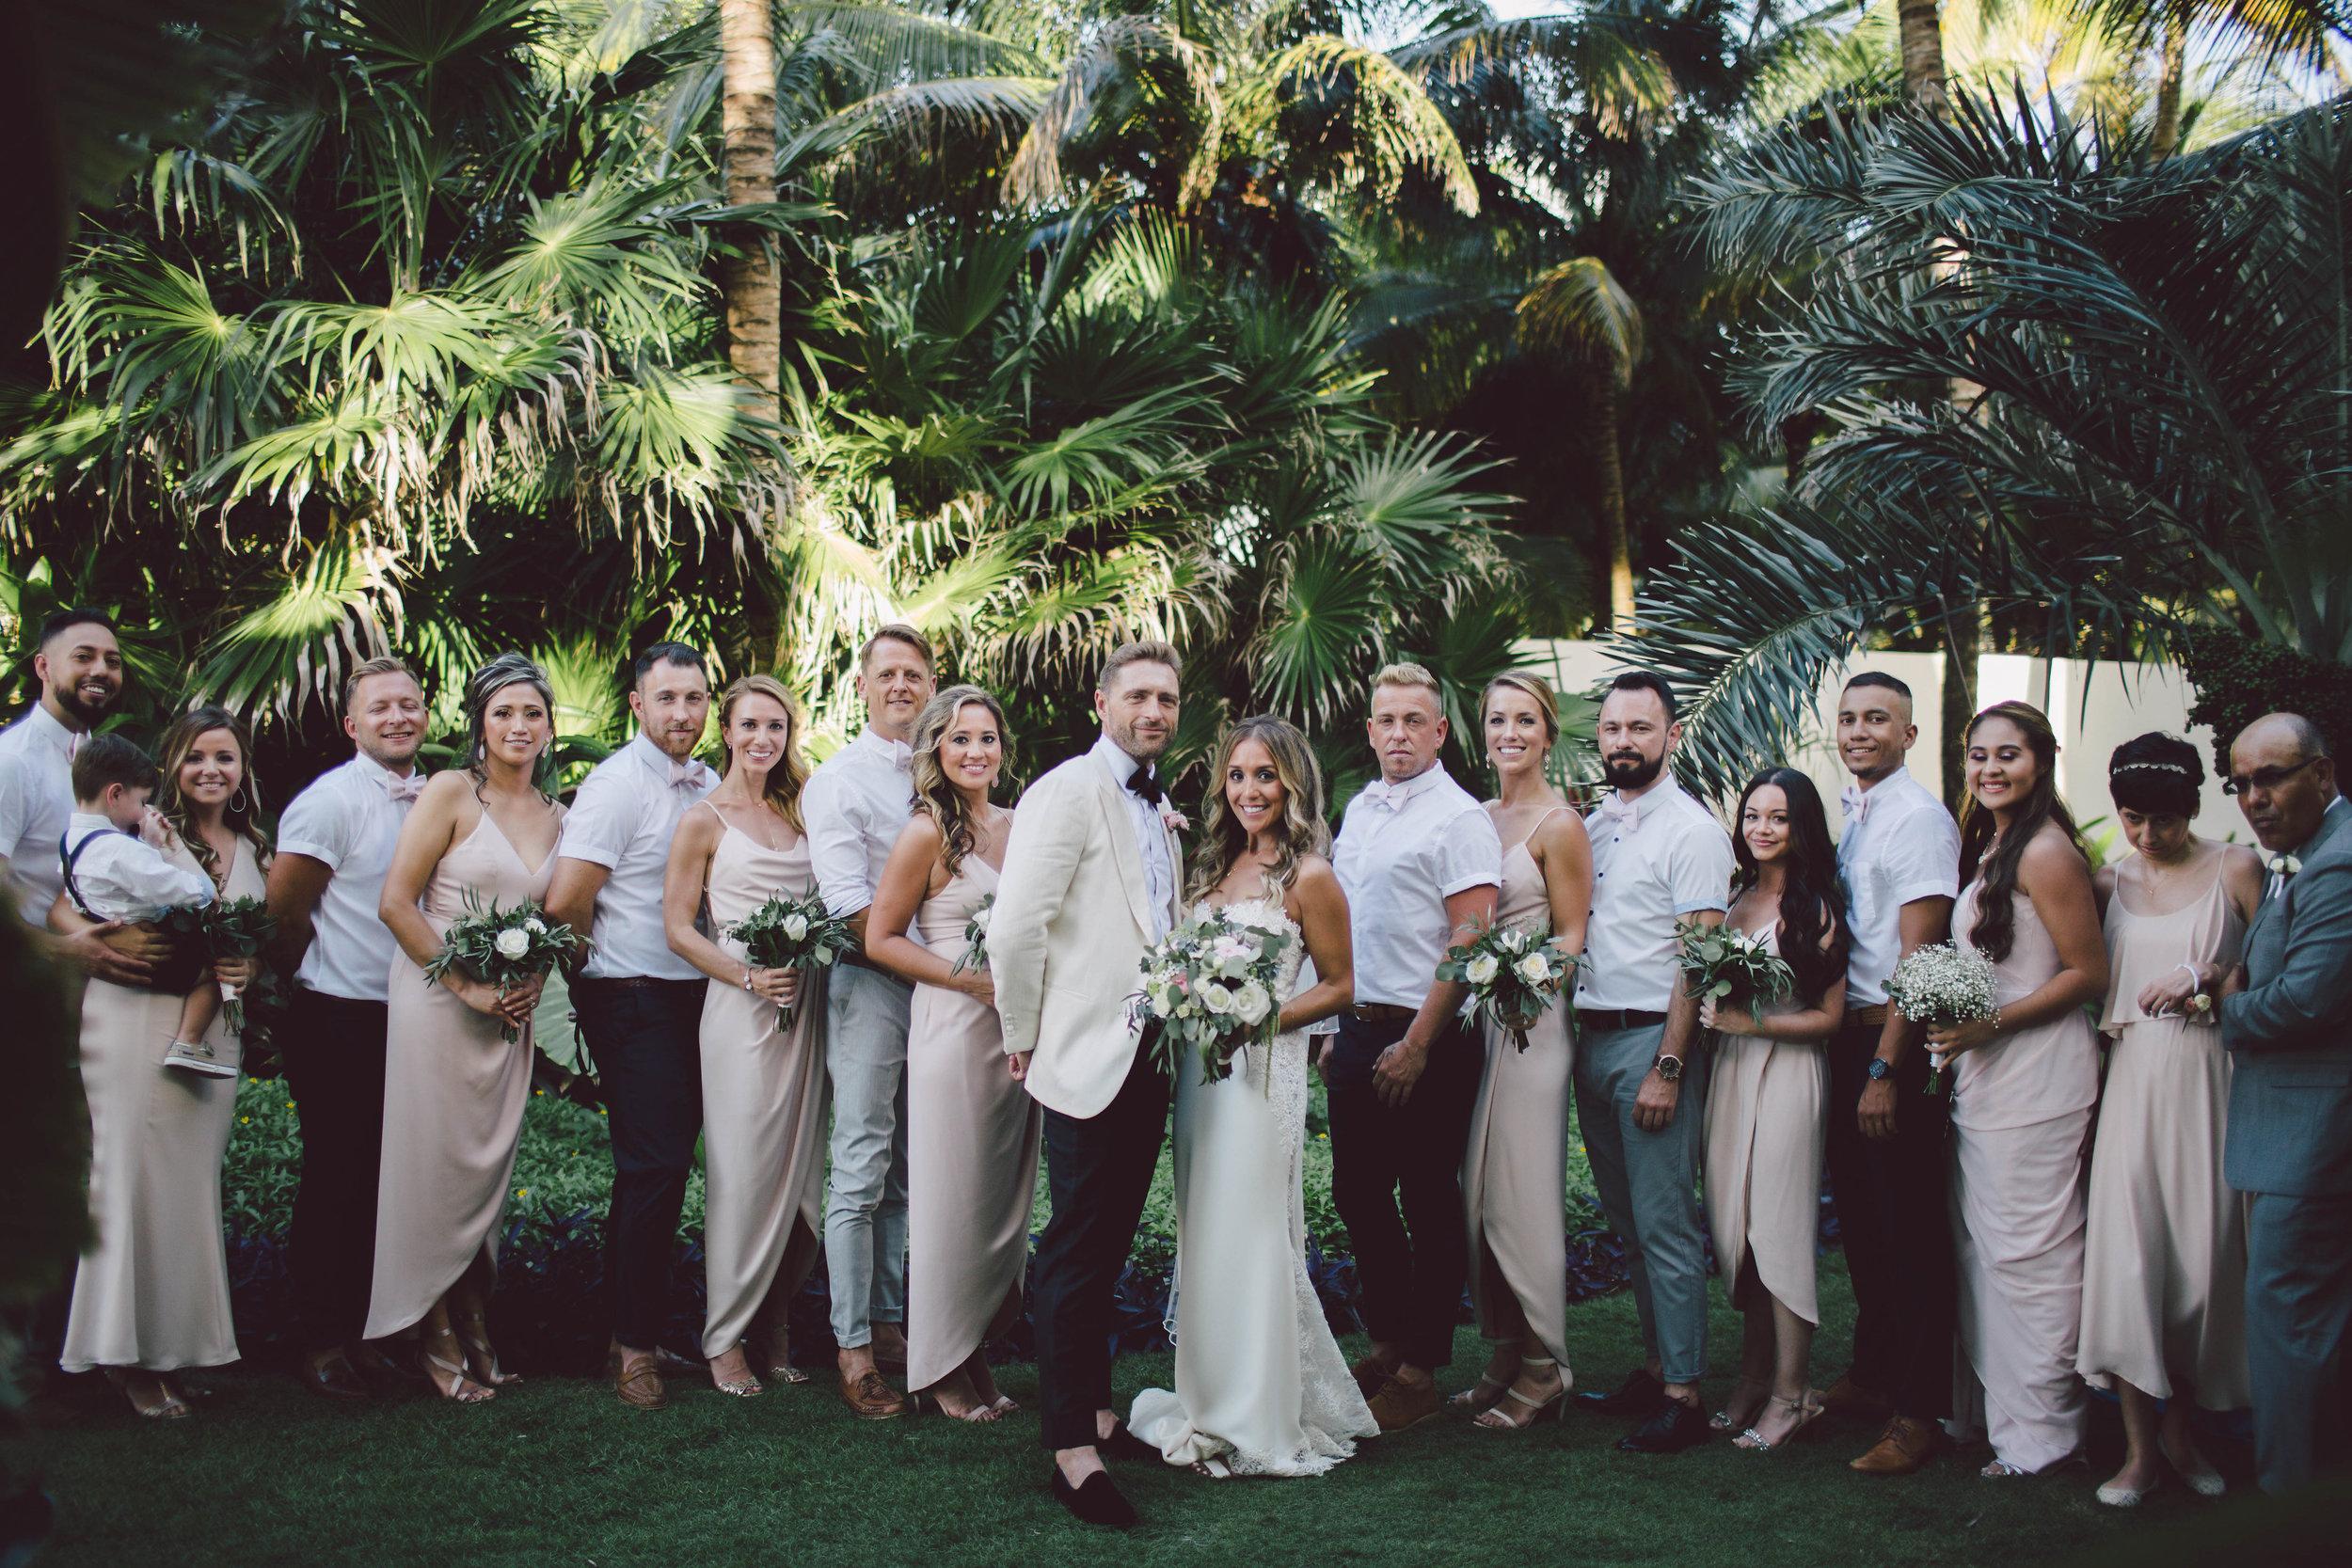 mexico_wedding_cancun_villa_la_joya_evangeline_lane_079.jpg